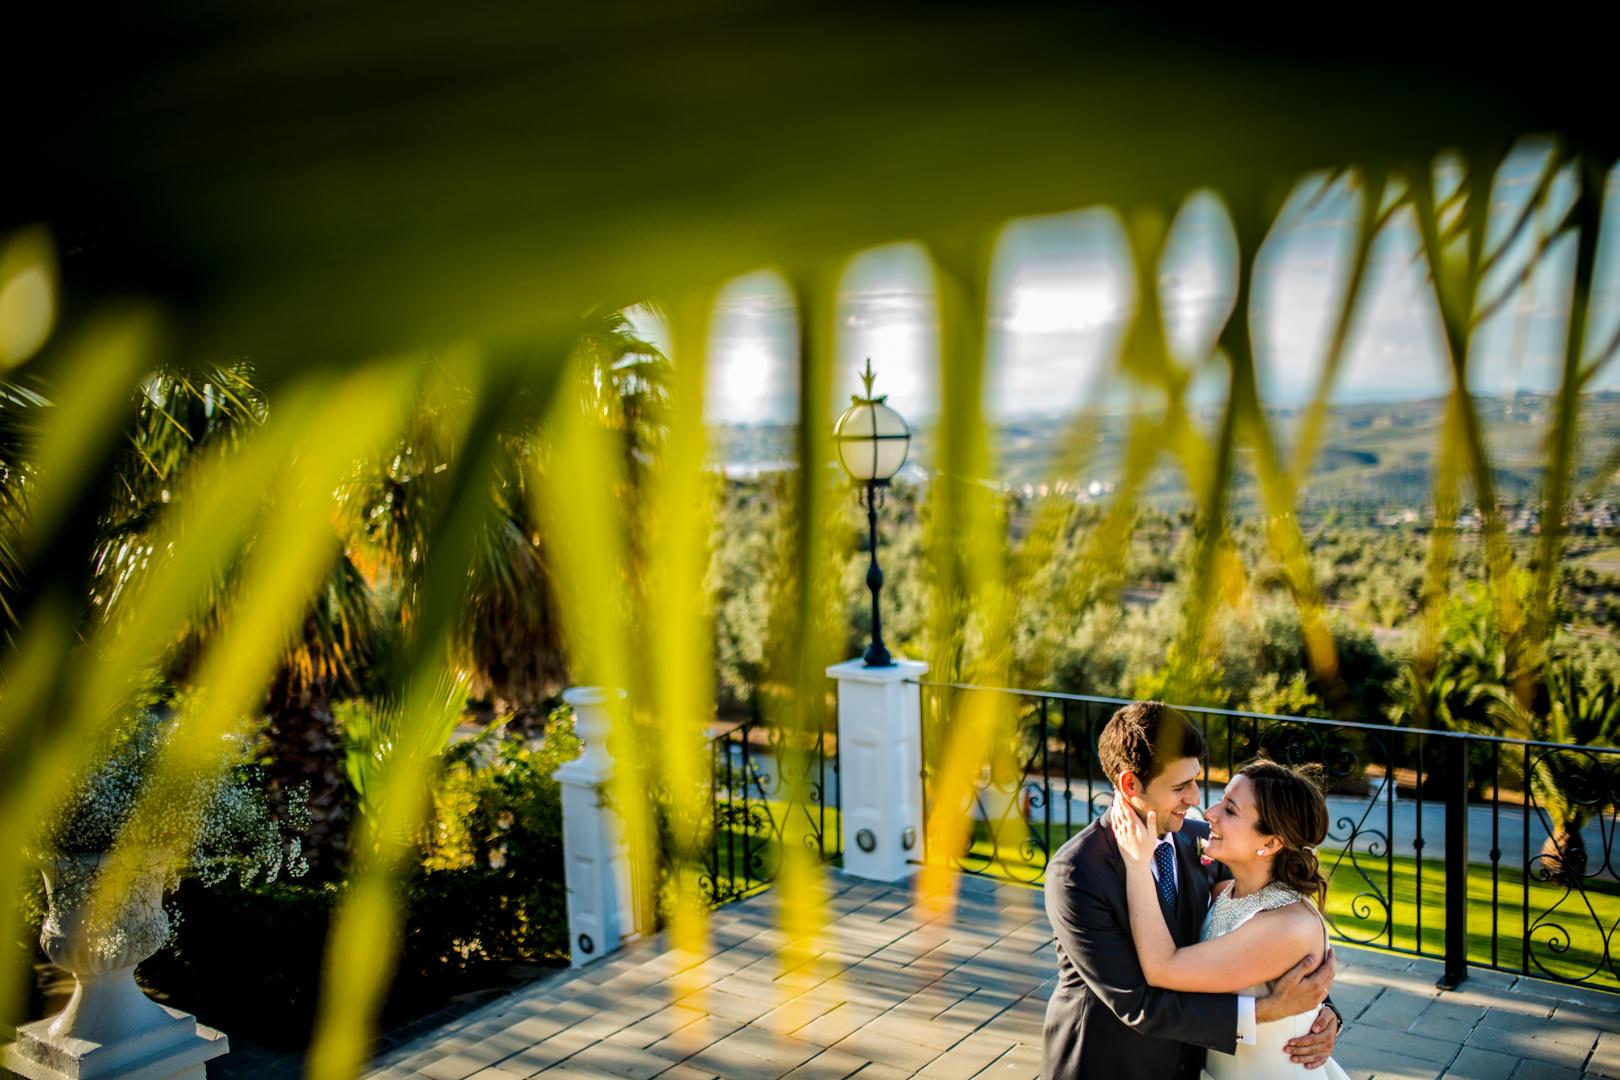 Boda-Catedral-Jaen-Hamburgo-Maria-David-engagement-Rafael-Torres-fotografo-bodas-sevilla-madrid-barcelona-wedding-photographer--50.jpg